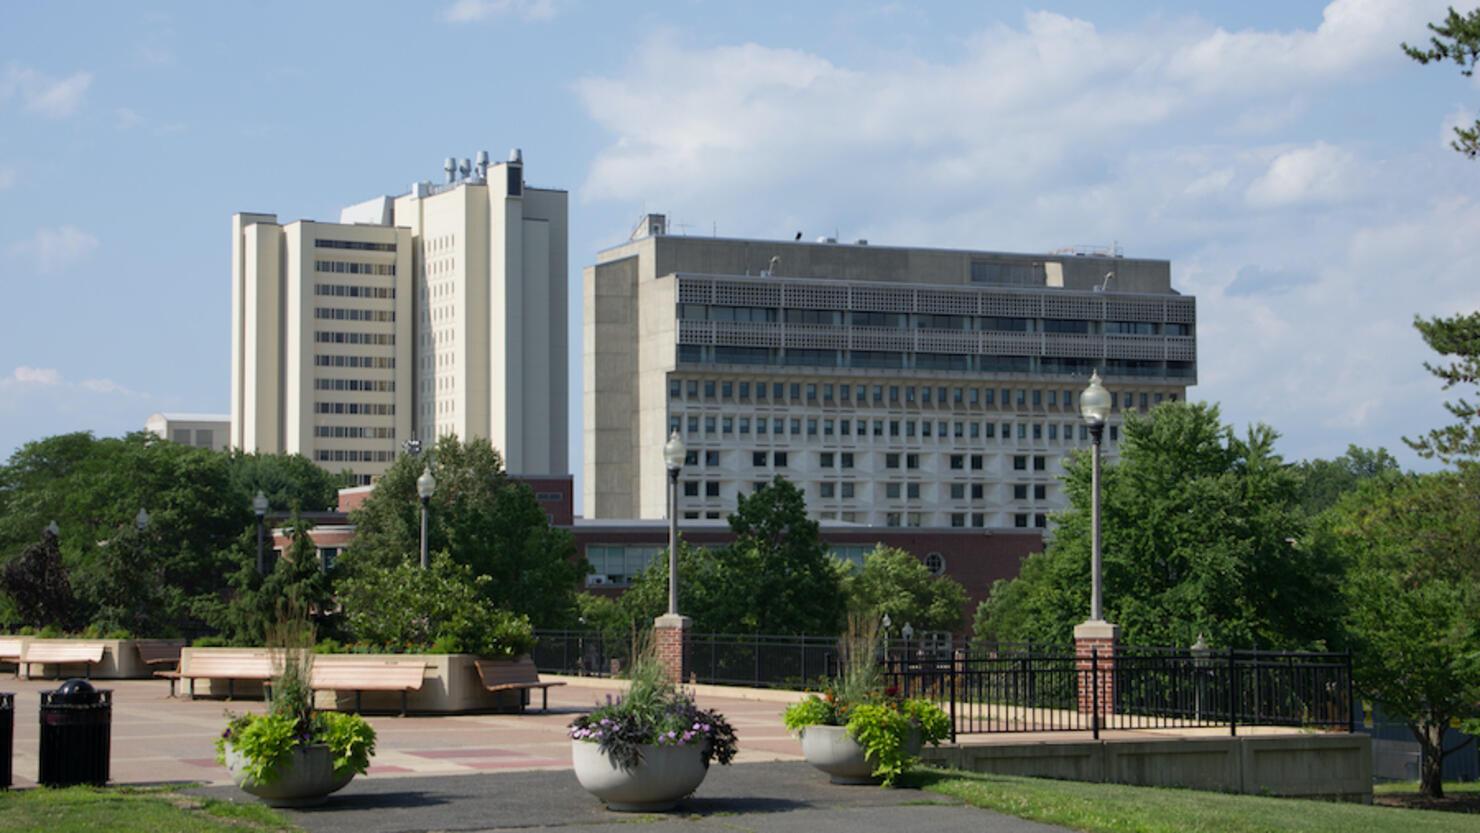 School buildings at UMass Amherst